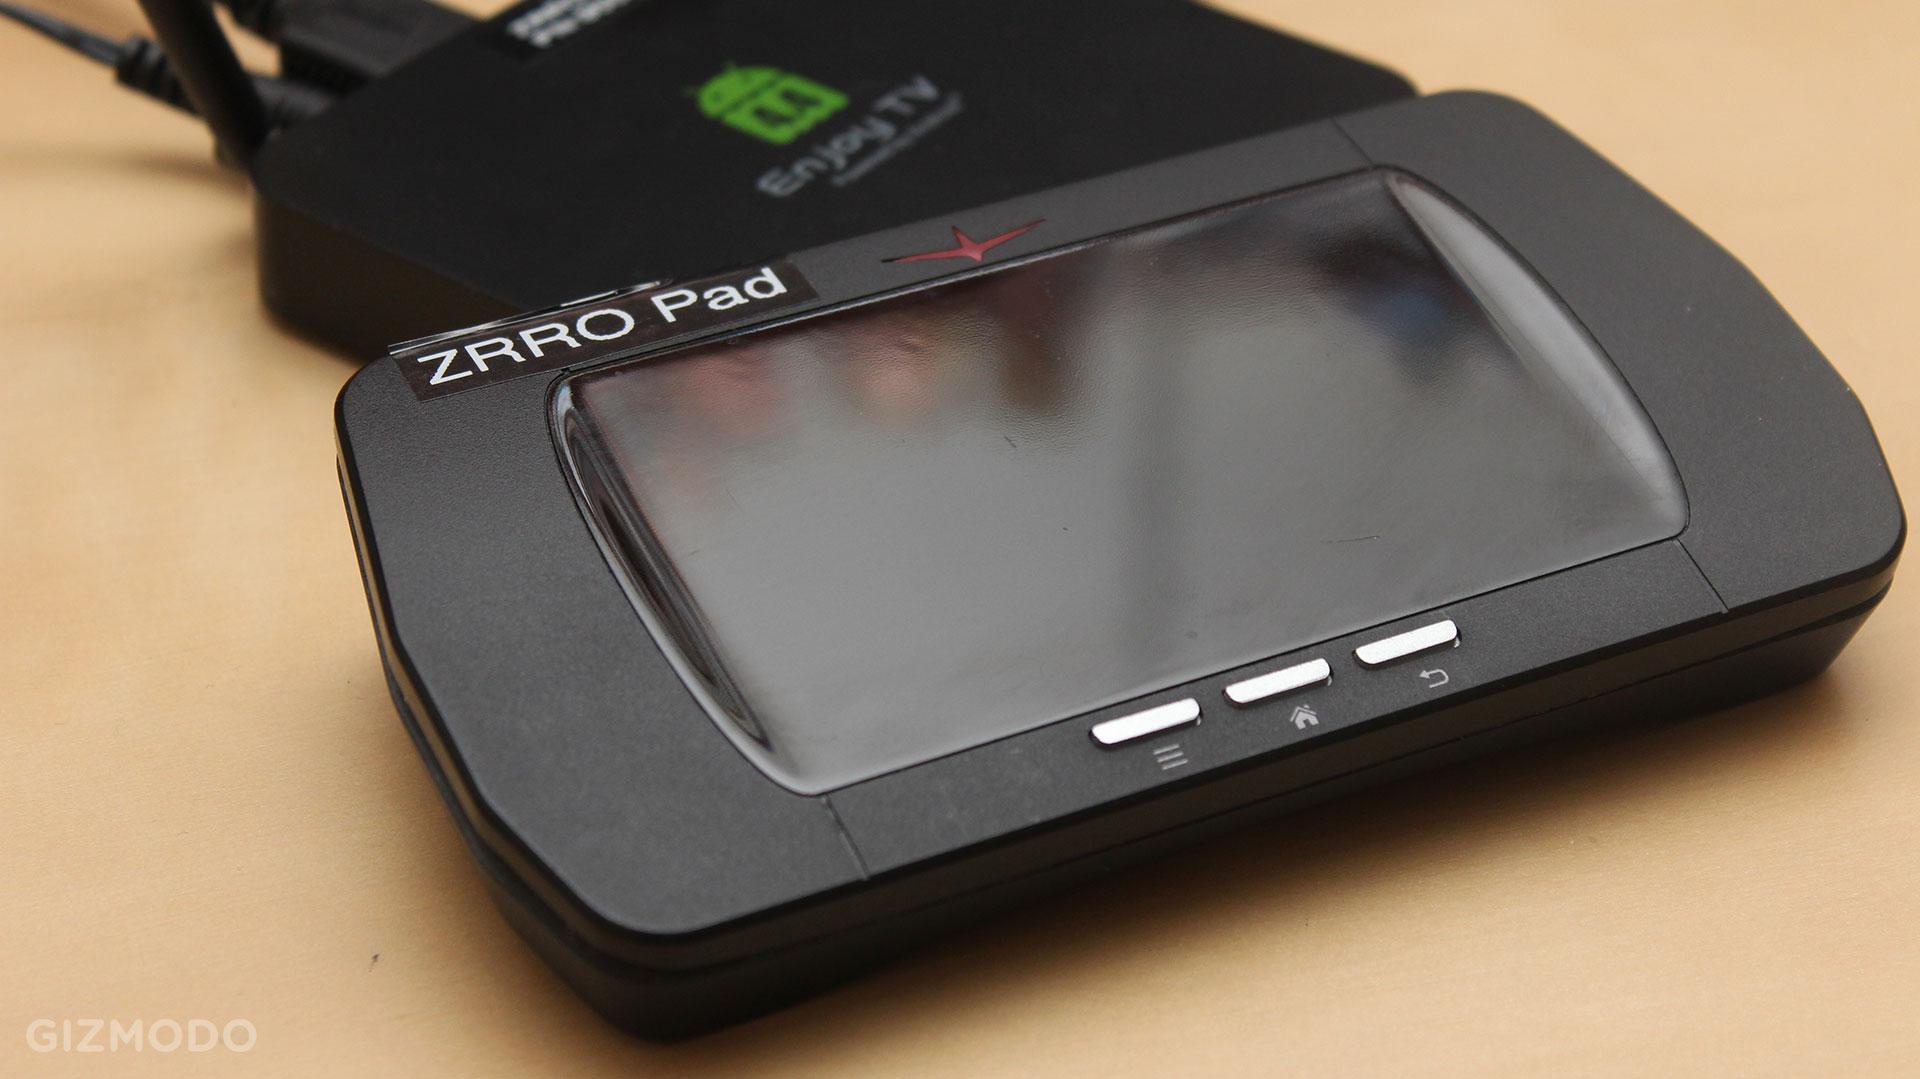 zrro gamepad